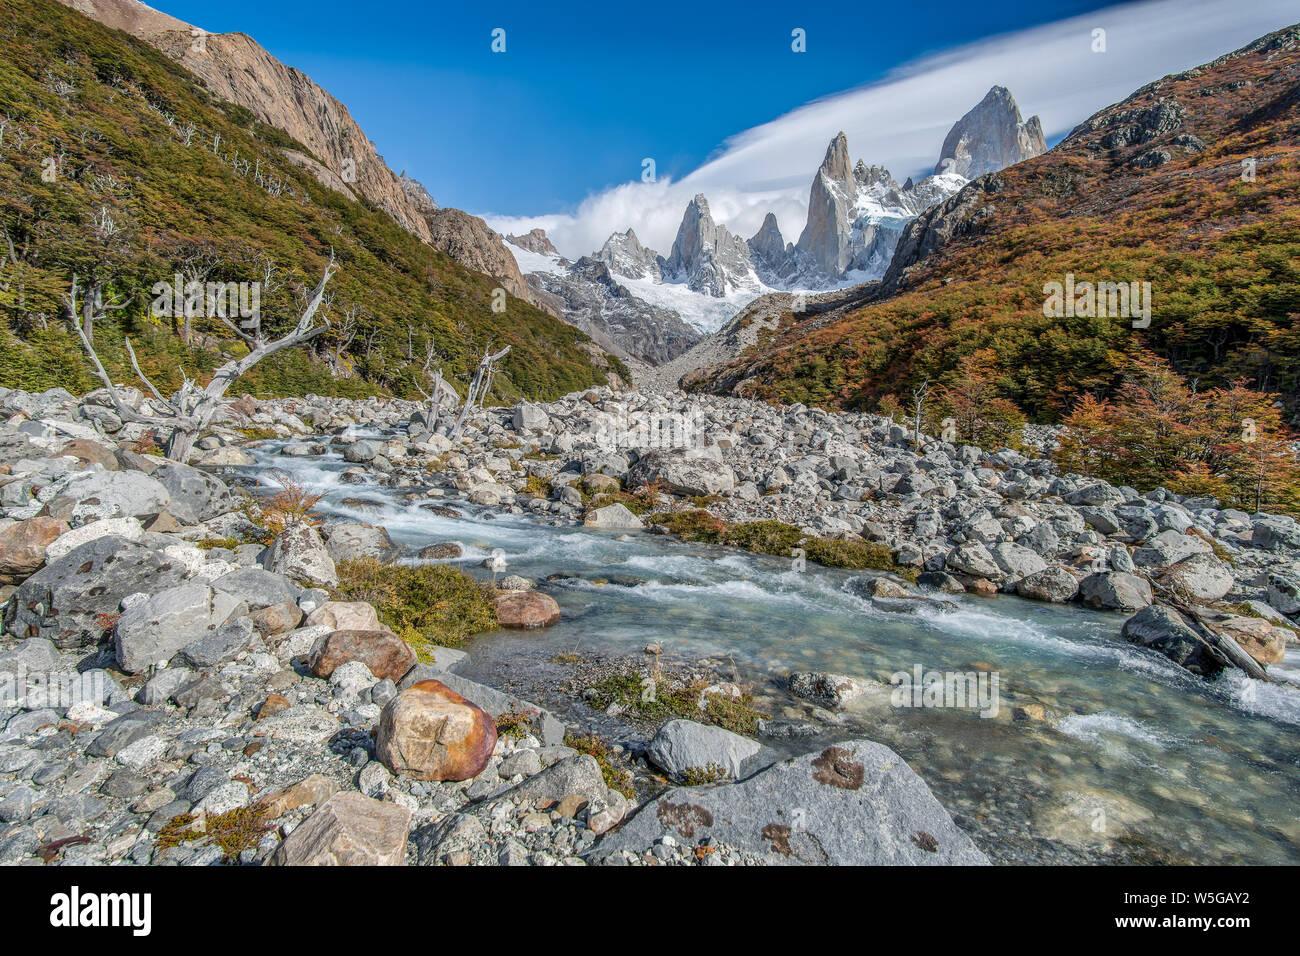 Trekking al Cerro Fitz Roy en El Chalten, Argentina Patagonia austral. Foto de stock